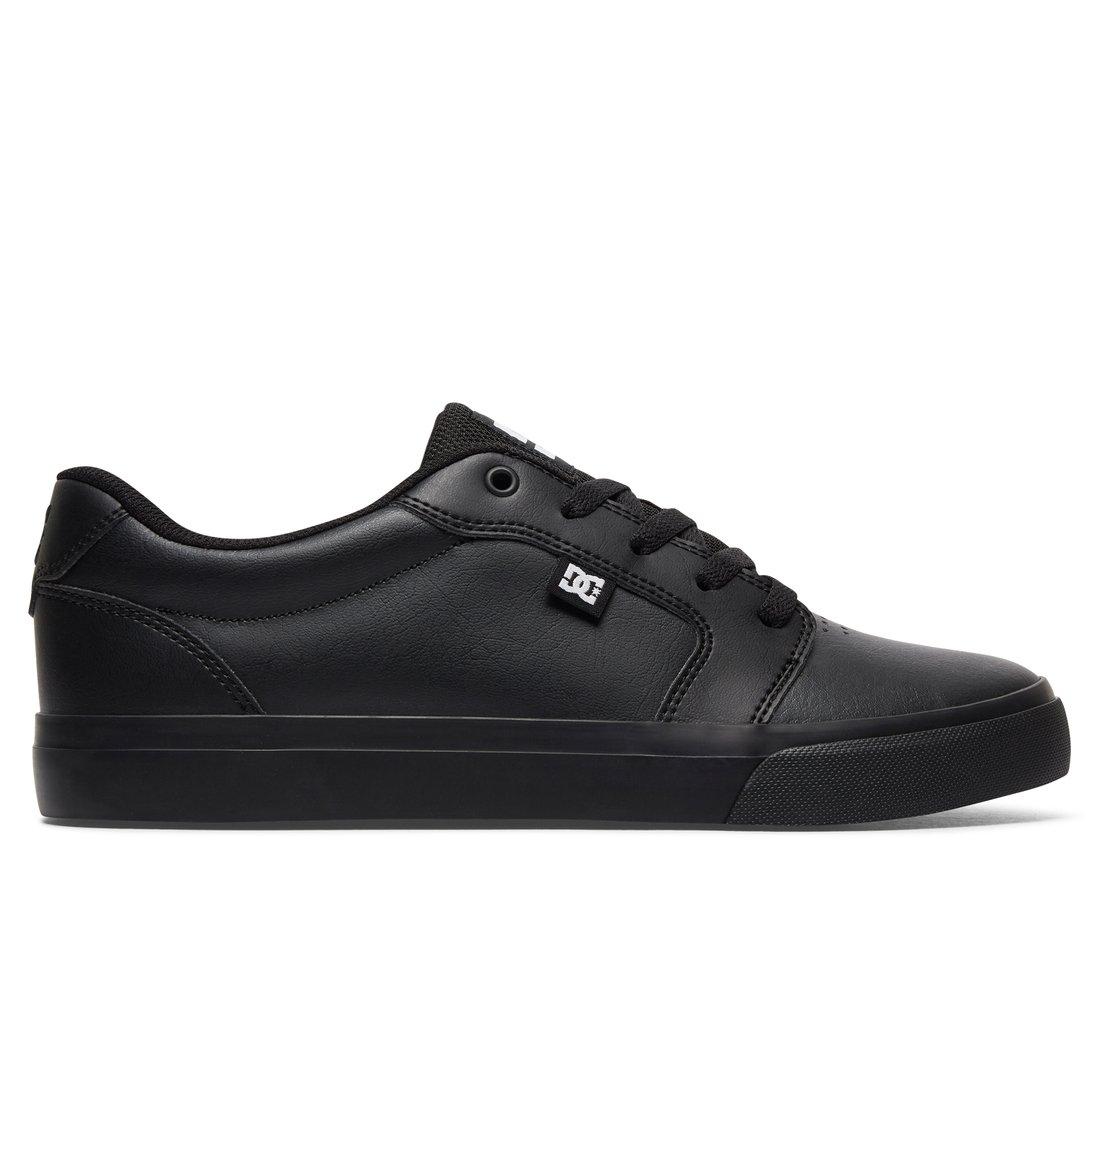 Men's Anvil SE Skateboarding Shoe